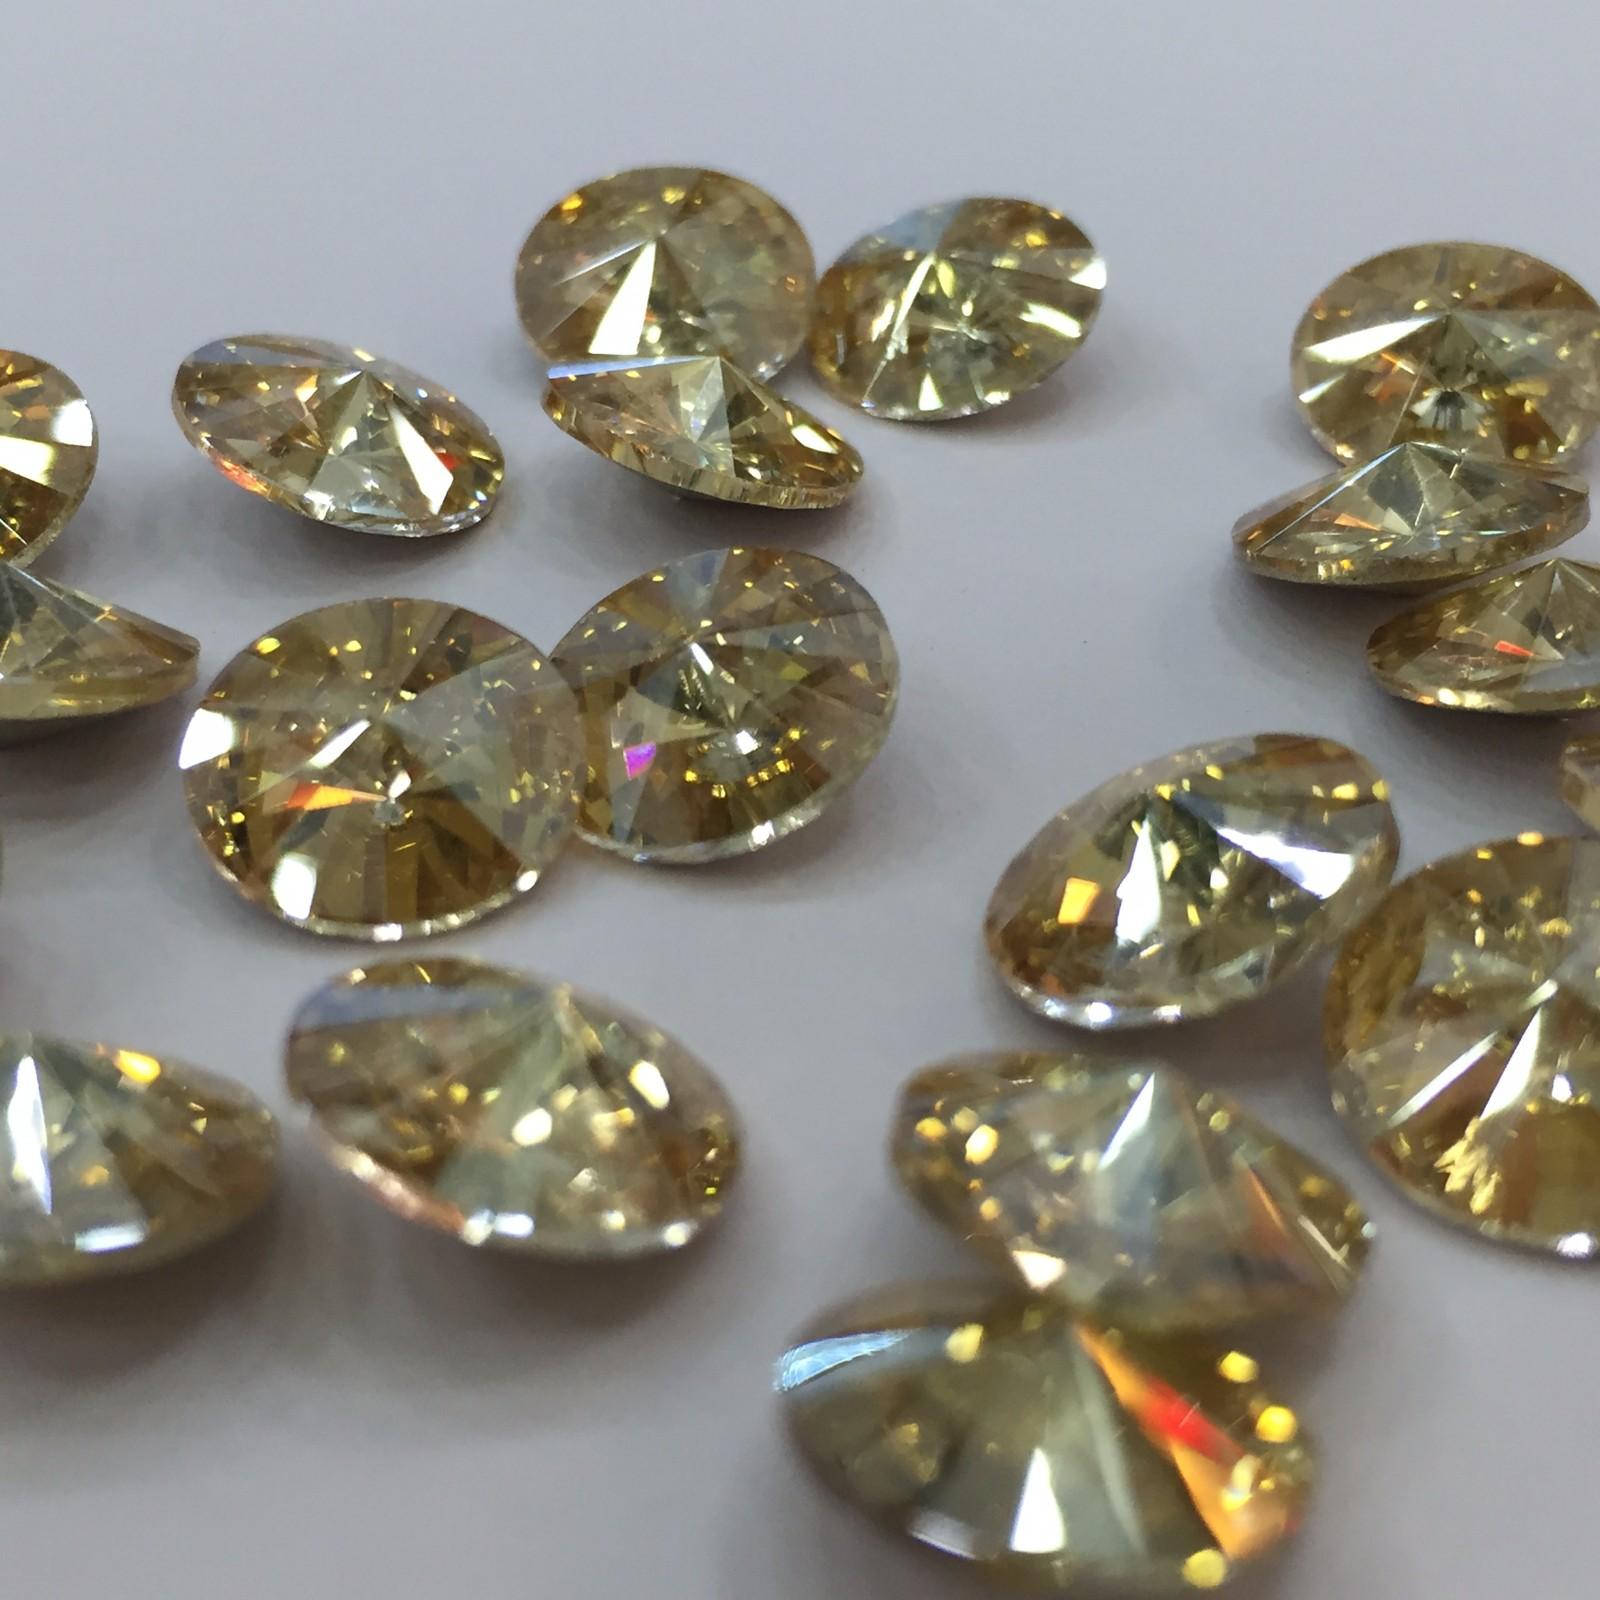 Jpstrass-Jp Strass Sew On Glass Flat Back Rhinestones Beads-1